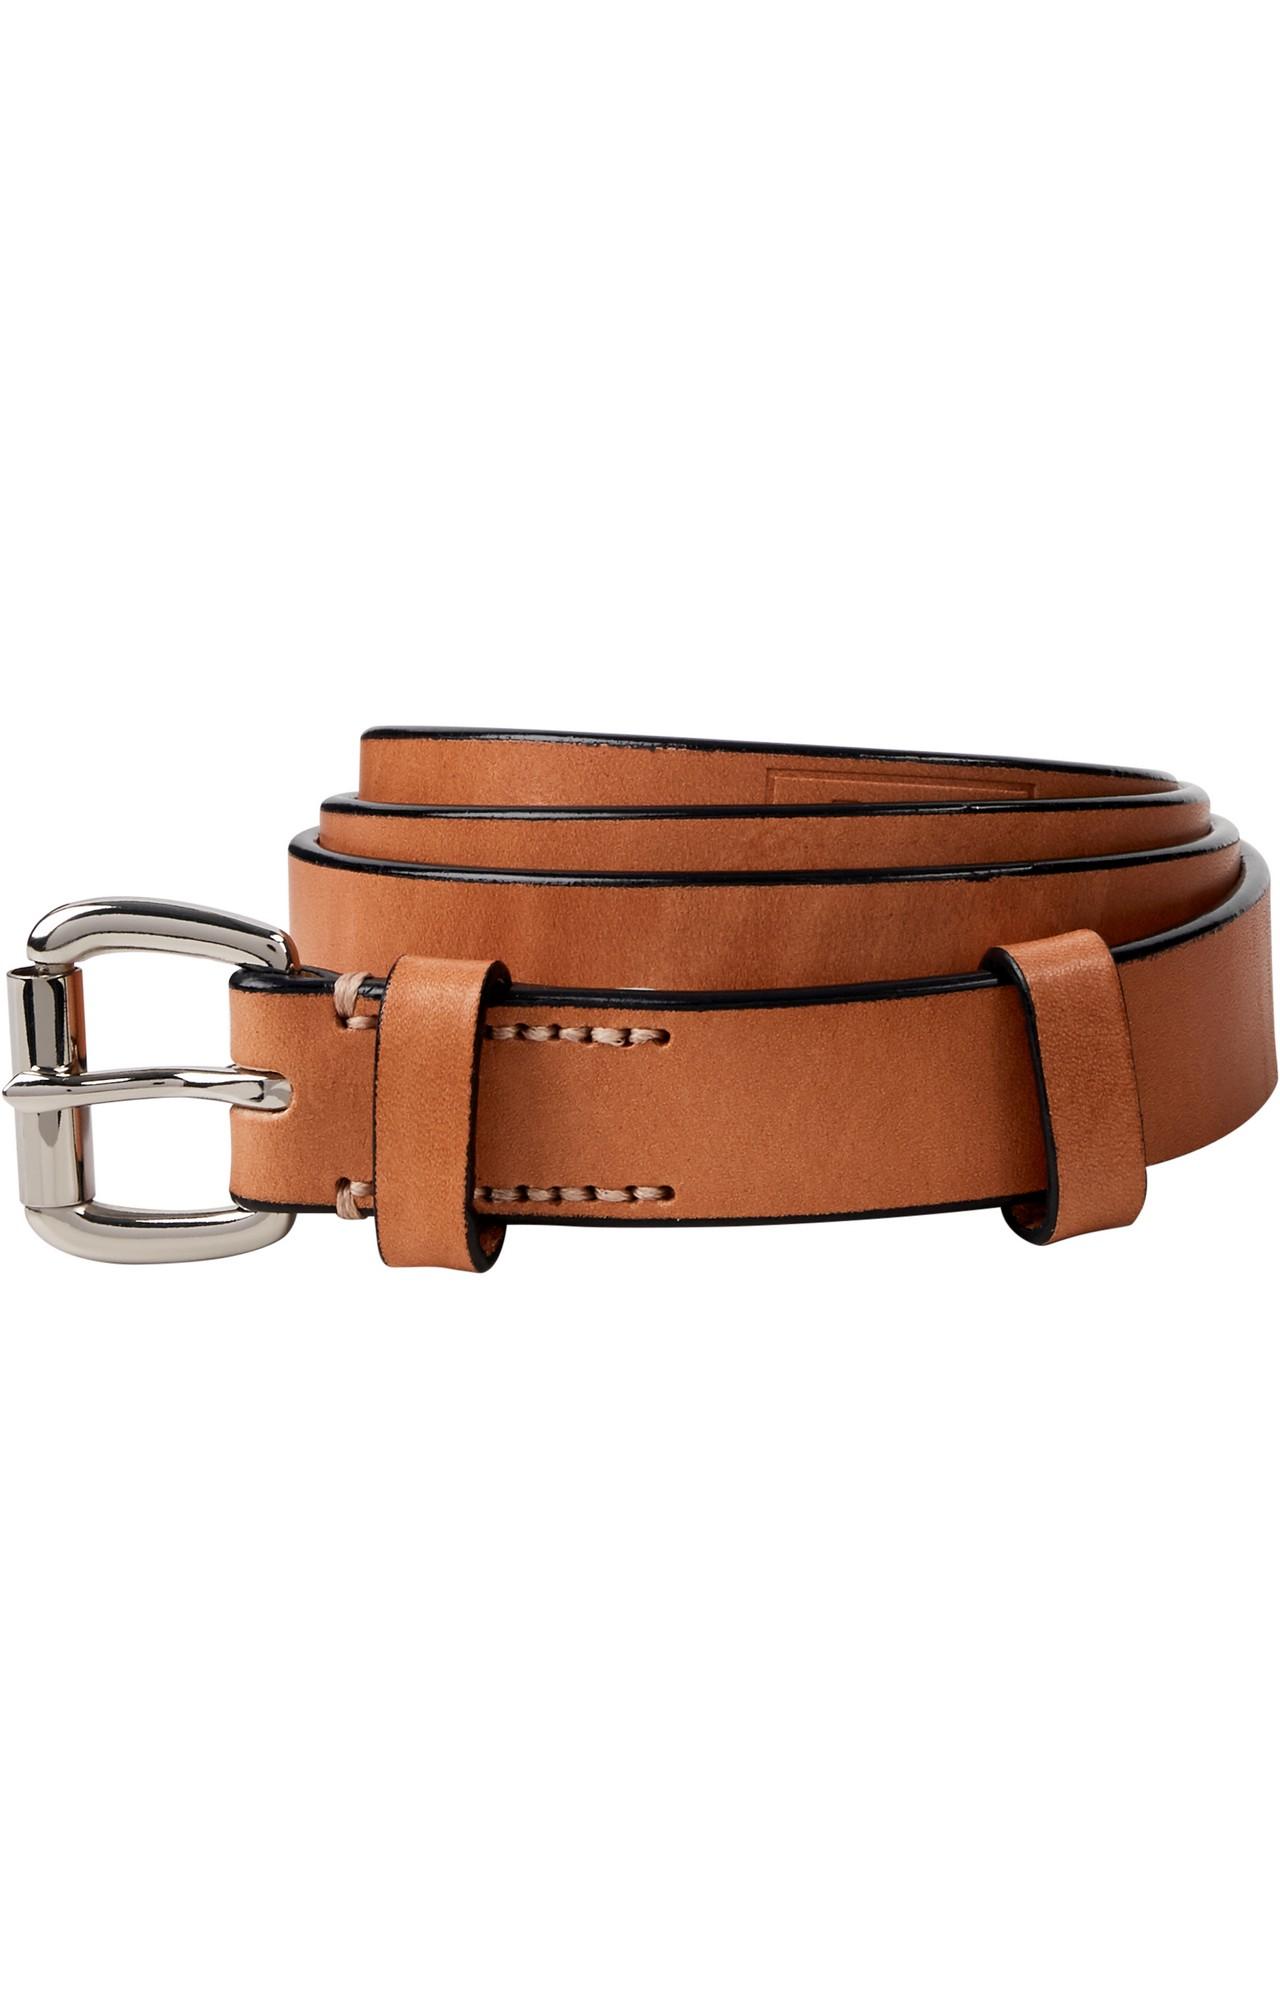 Scotch & Soda | Ams Blauw leather belt with contrast edge